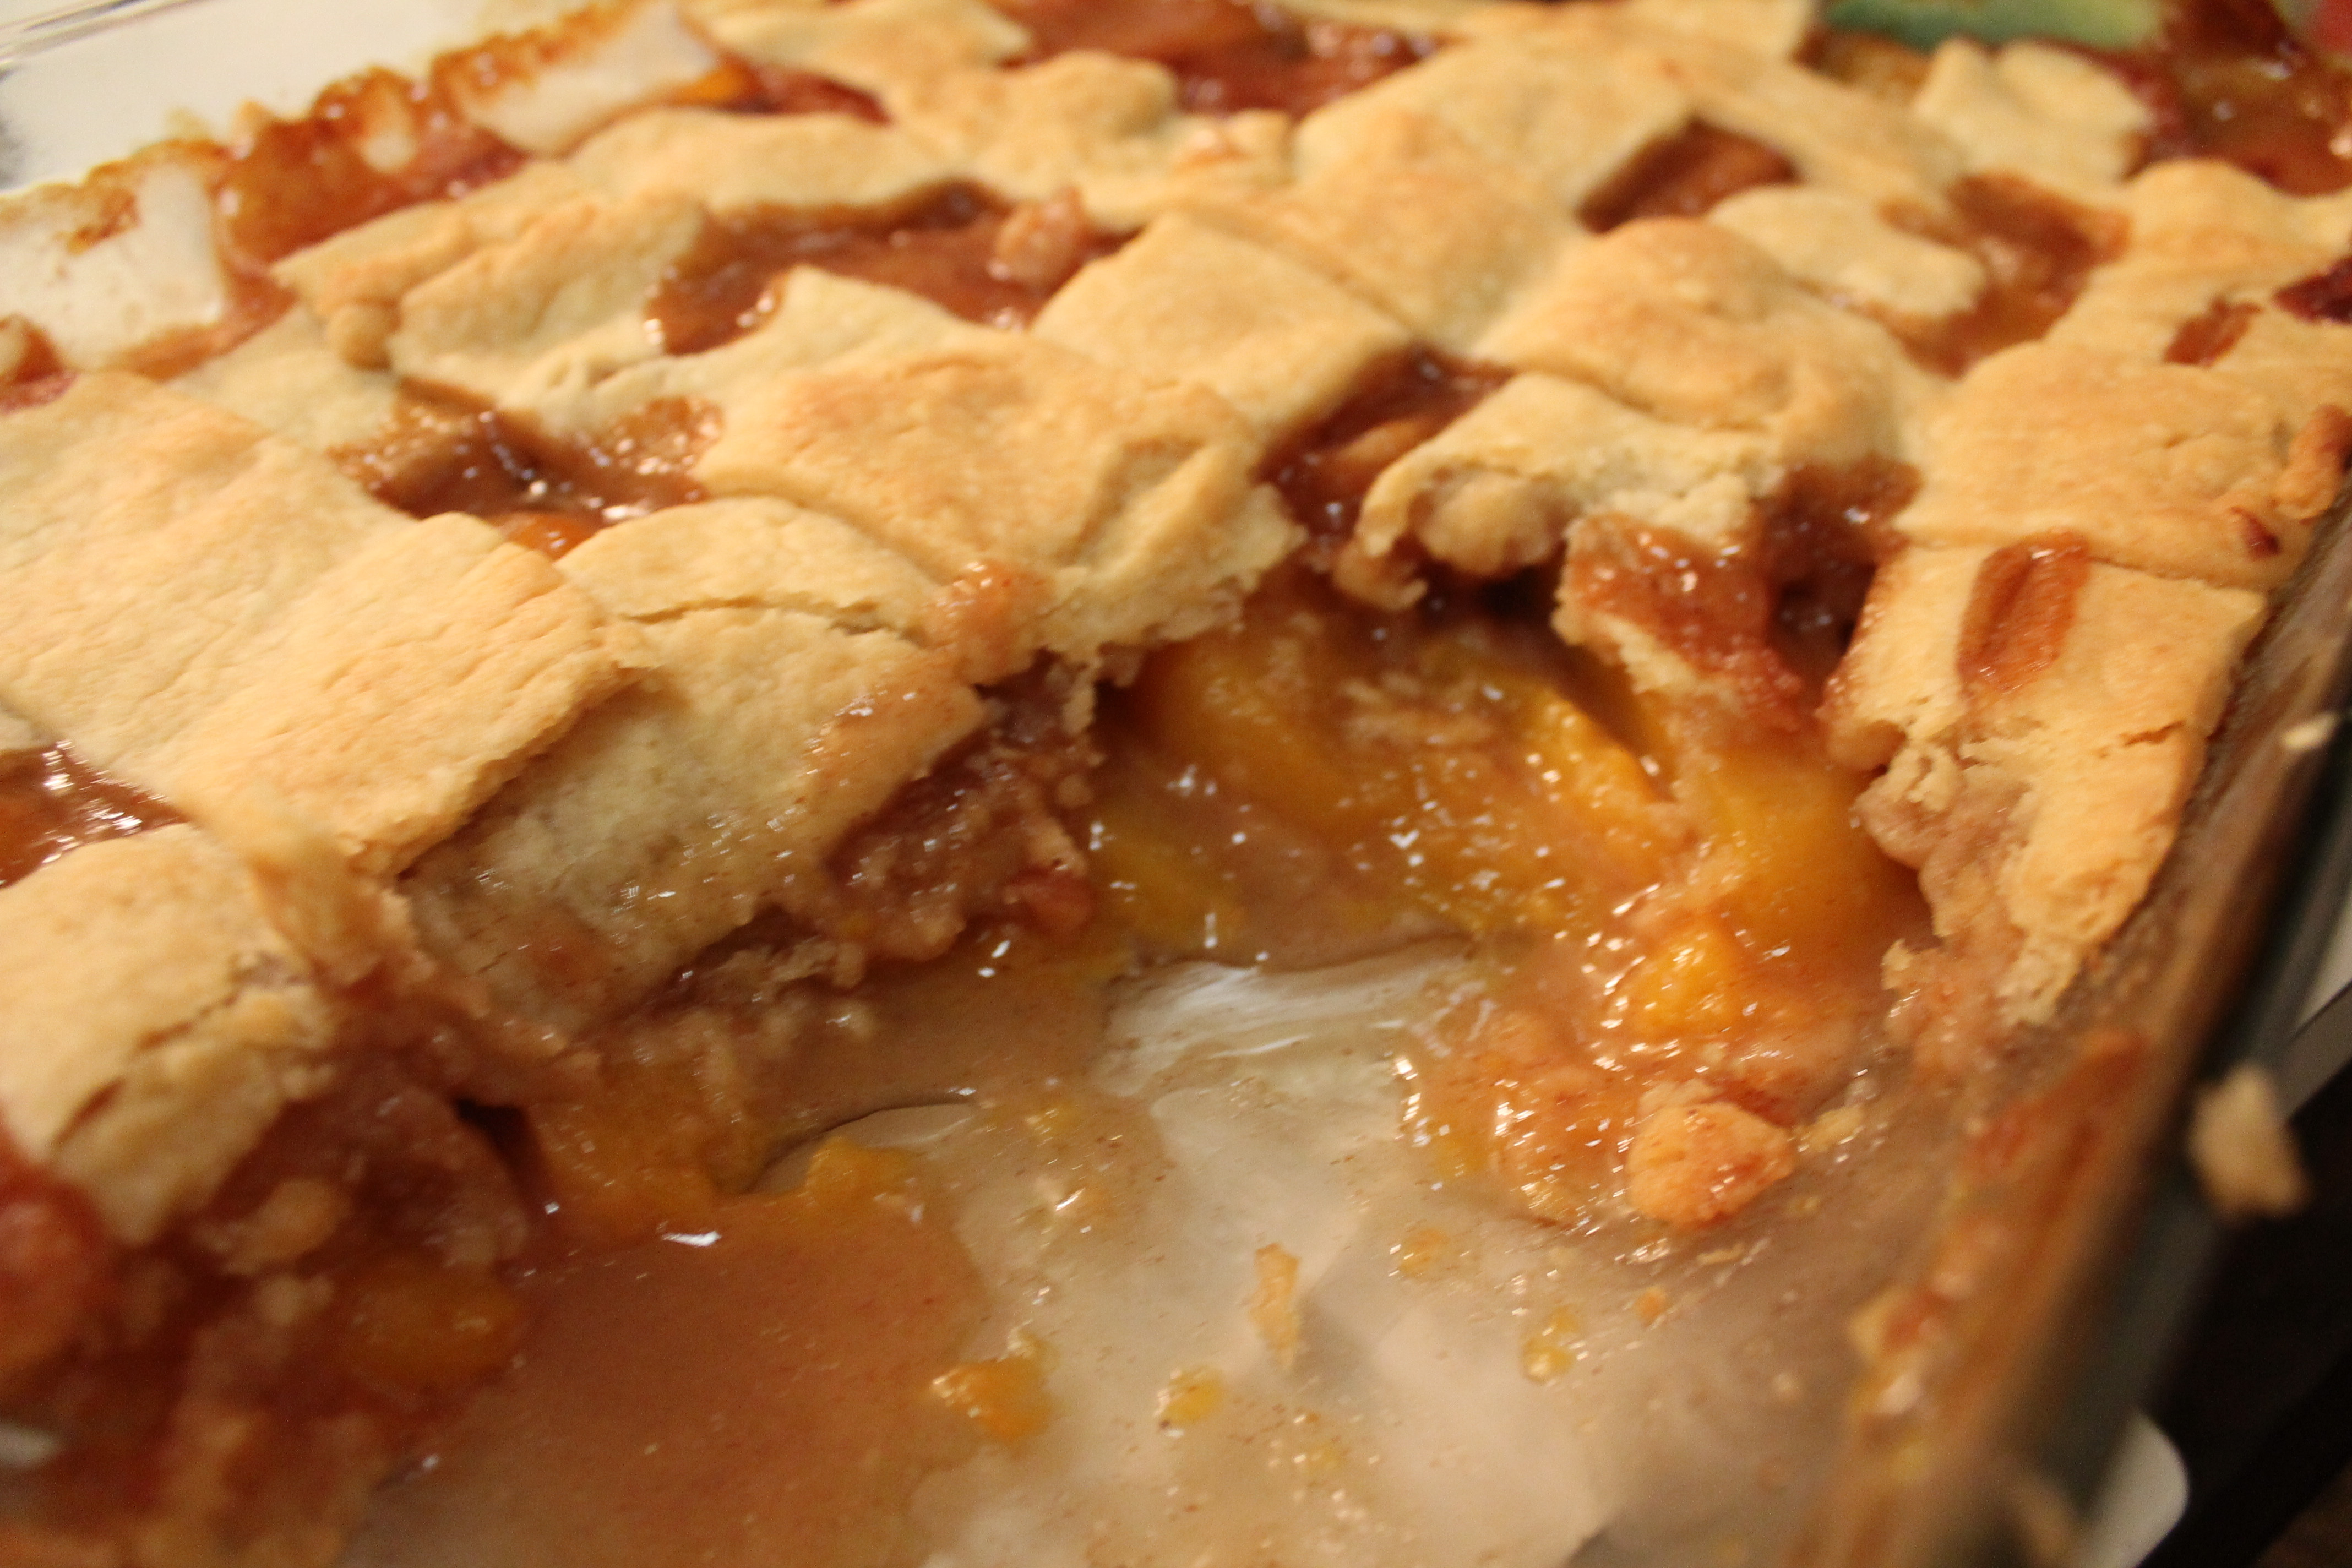 Southern Peach Cobbler Recipe  Grandma's Southern Peach Cobbler